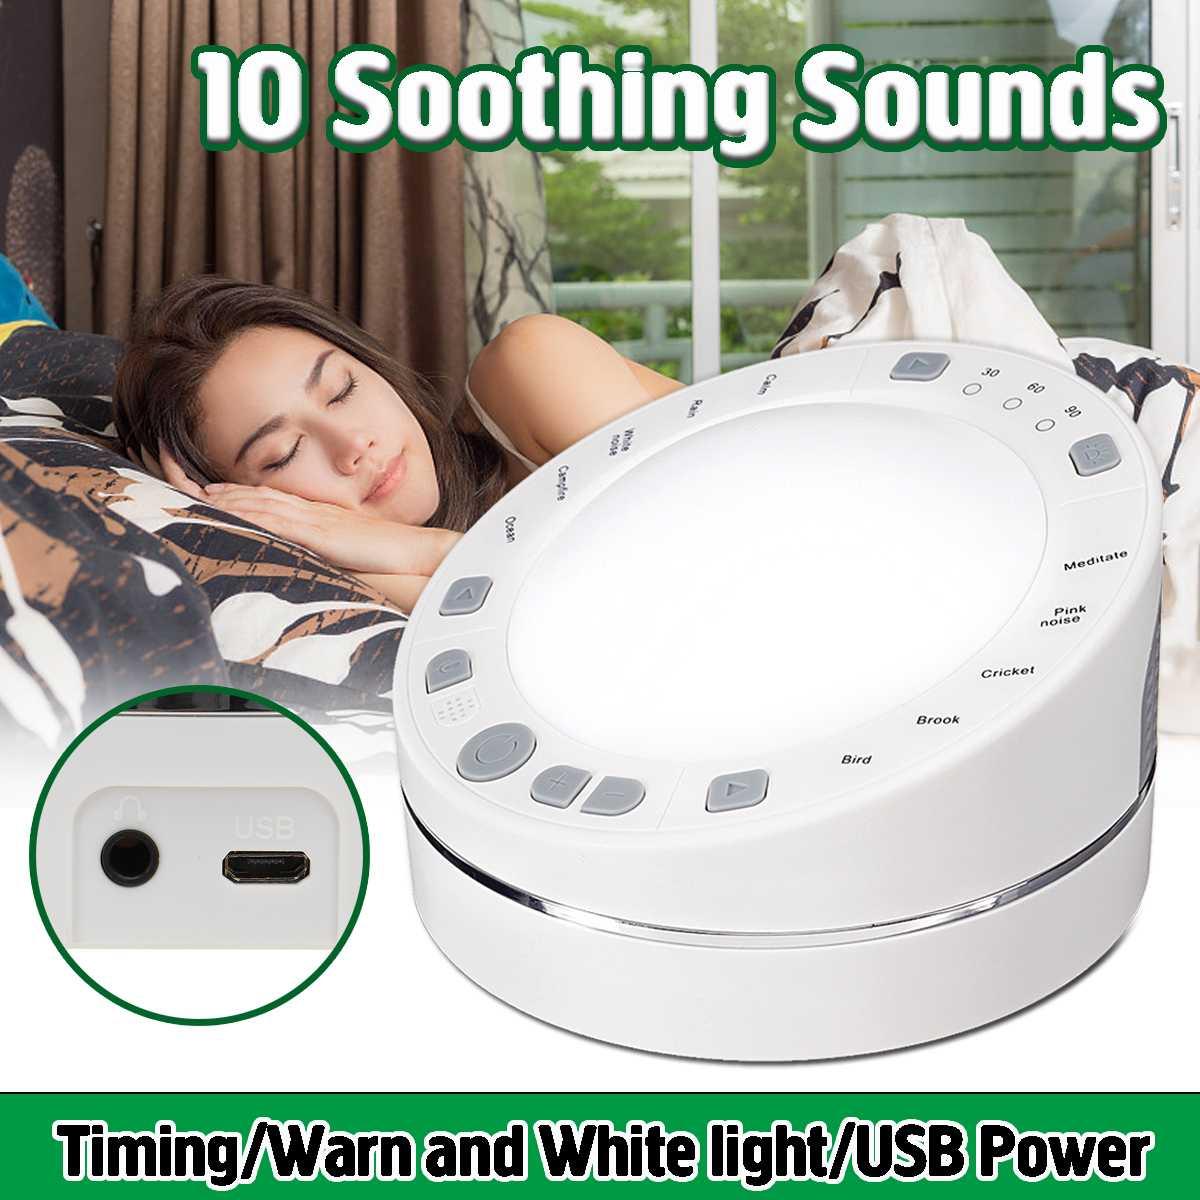 Sleep Sound Therapy Sound Machine Night Light USB Battery Ed White Noise Machine  For Sleeping Relaxation Sleep Instrument